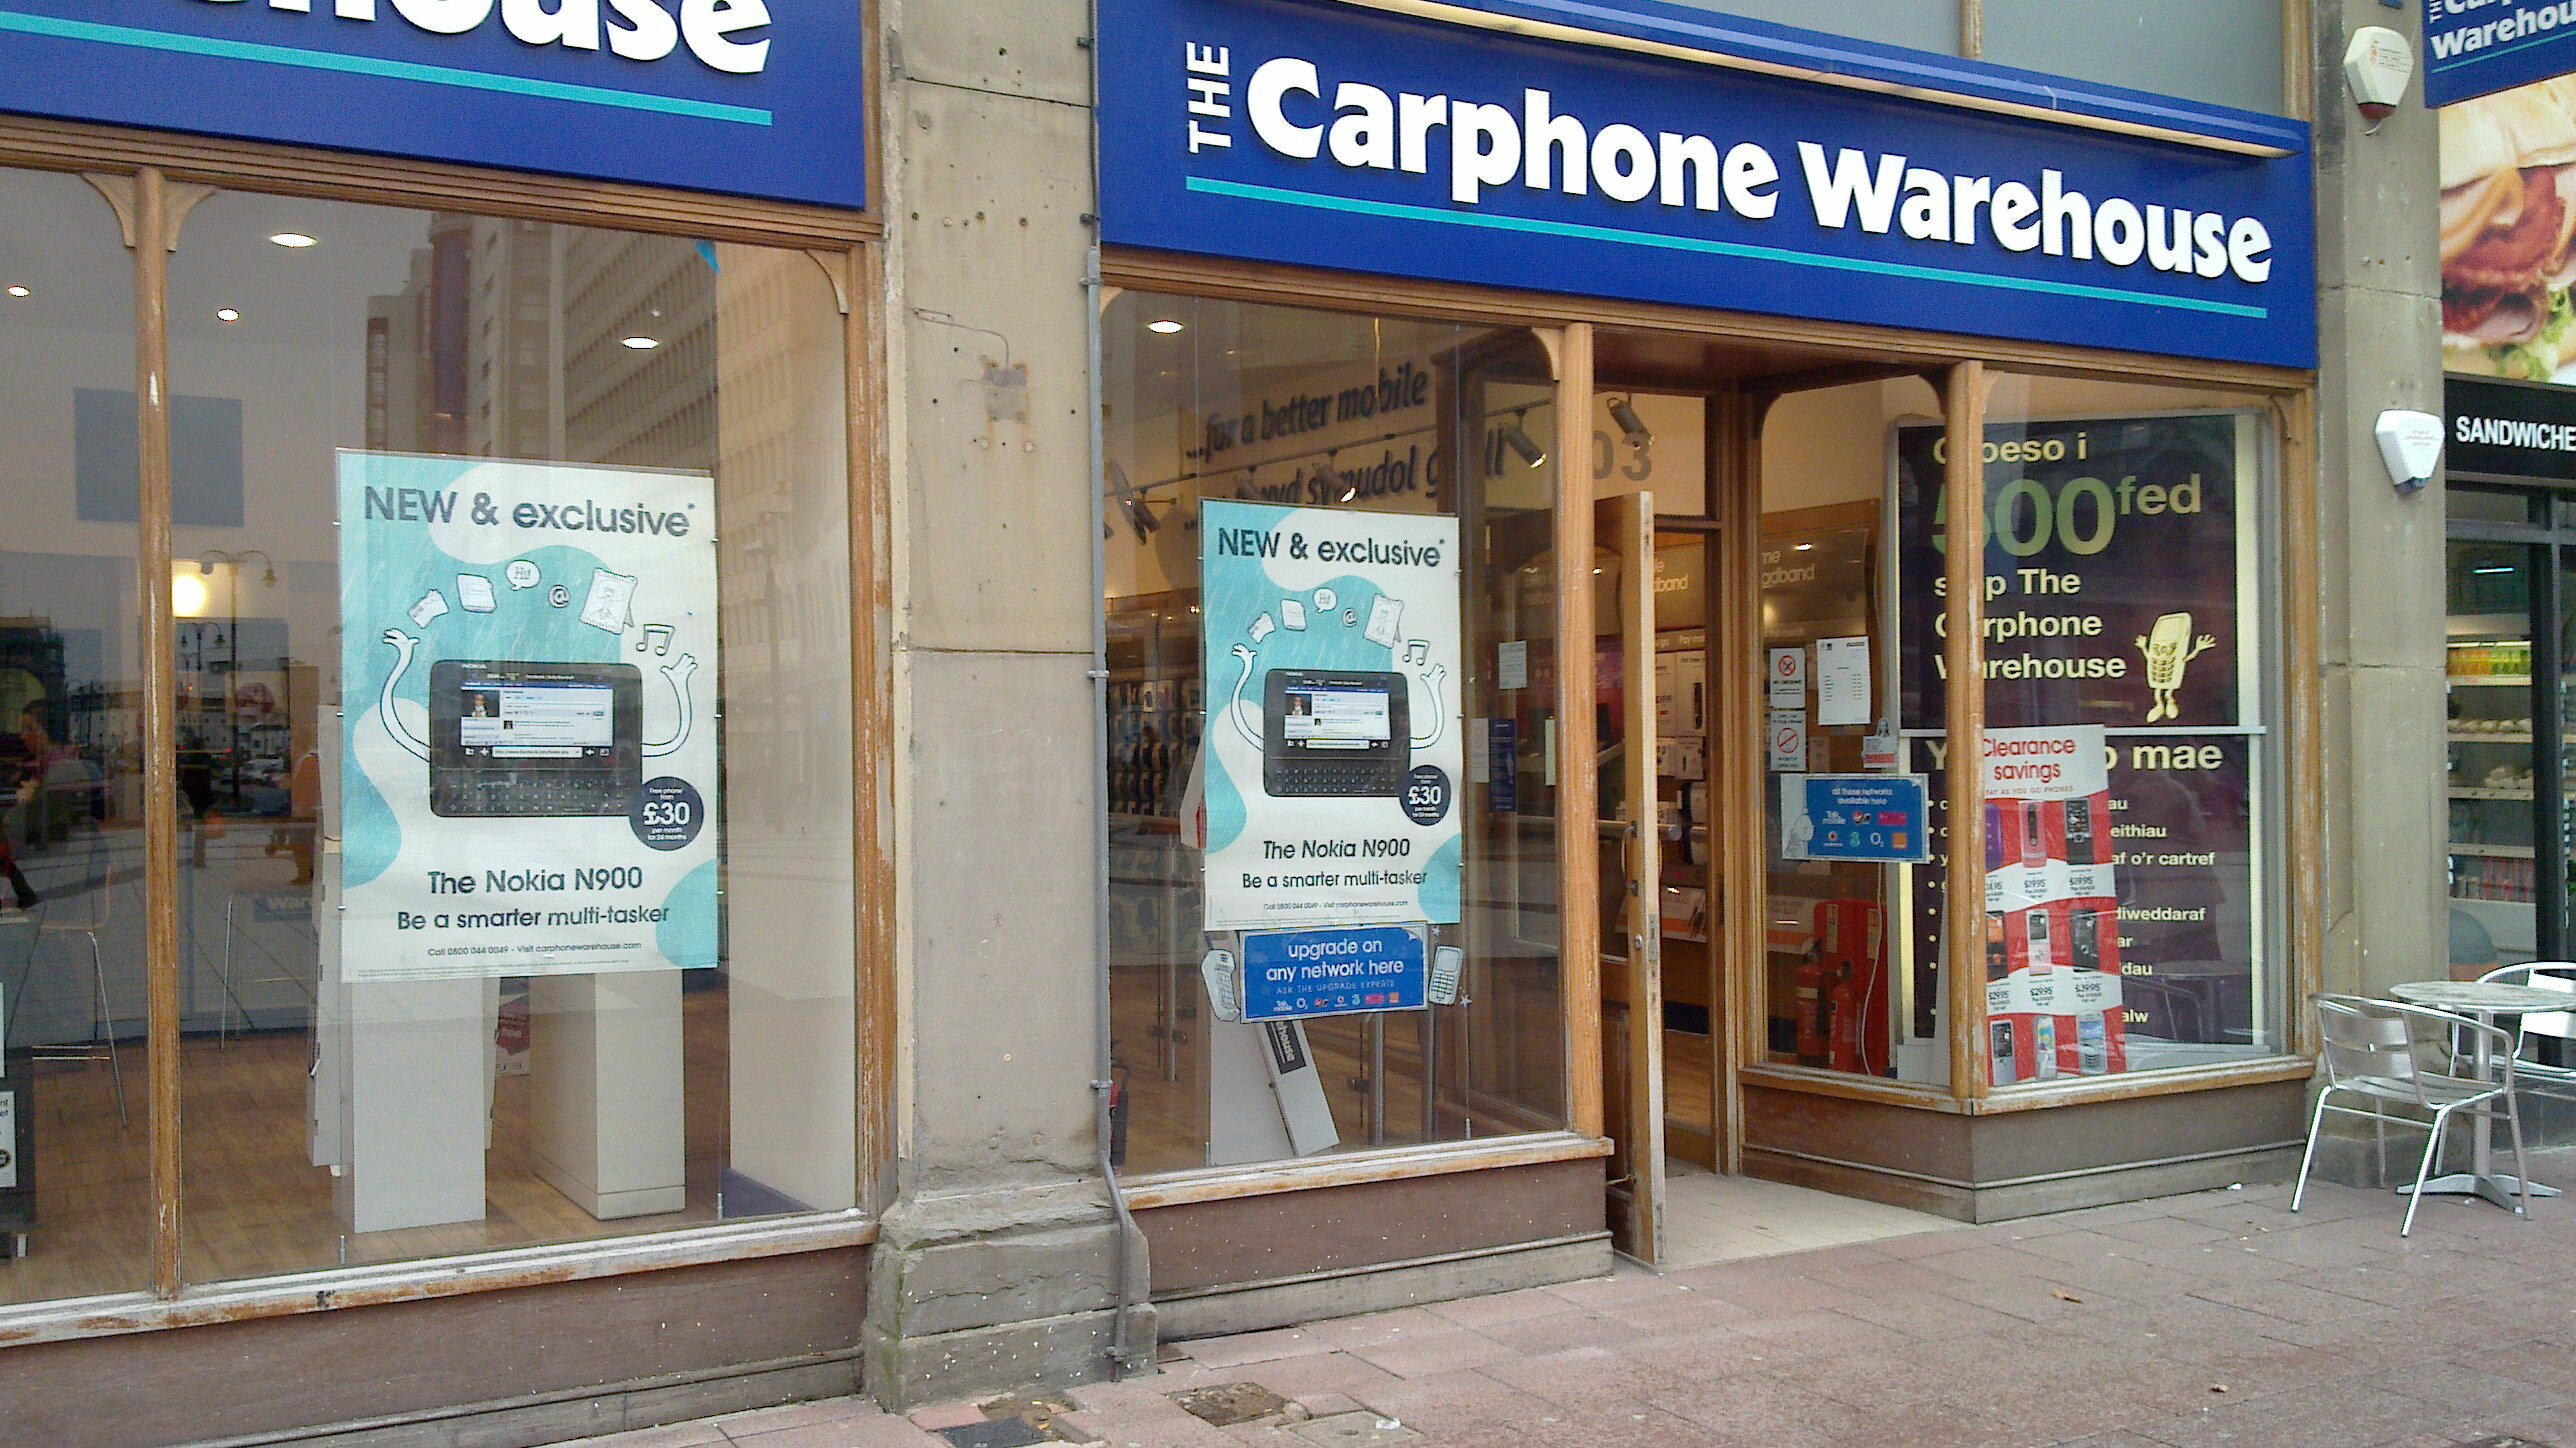 carphone warehouse - photo #33